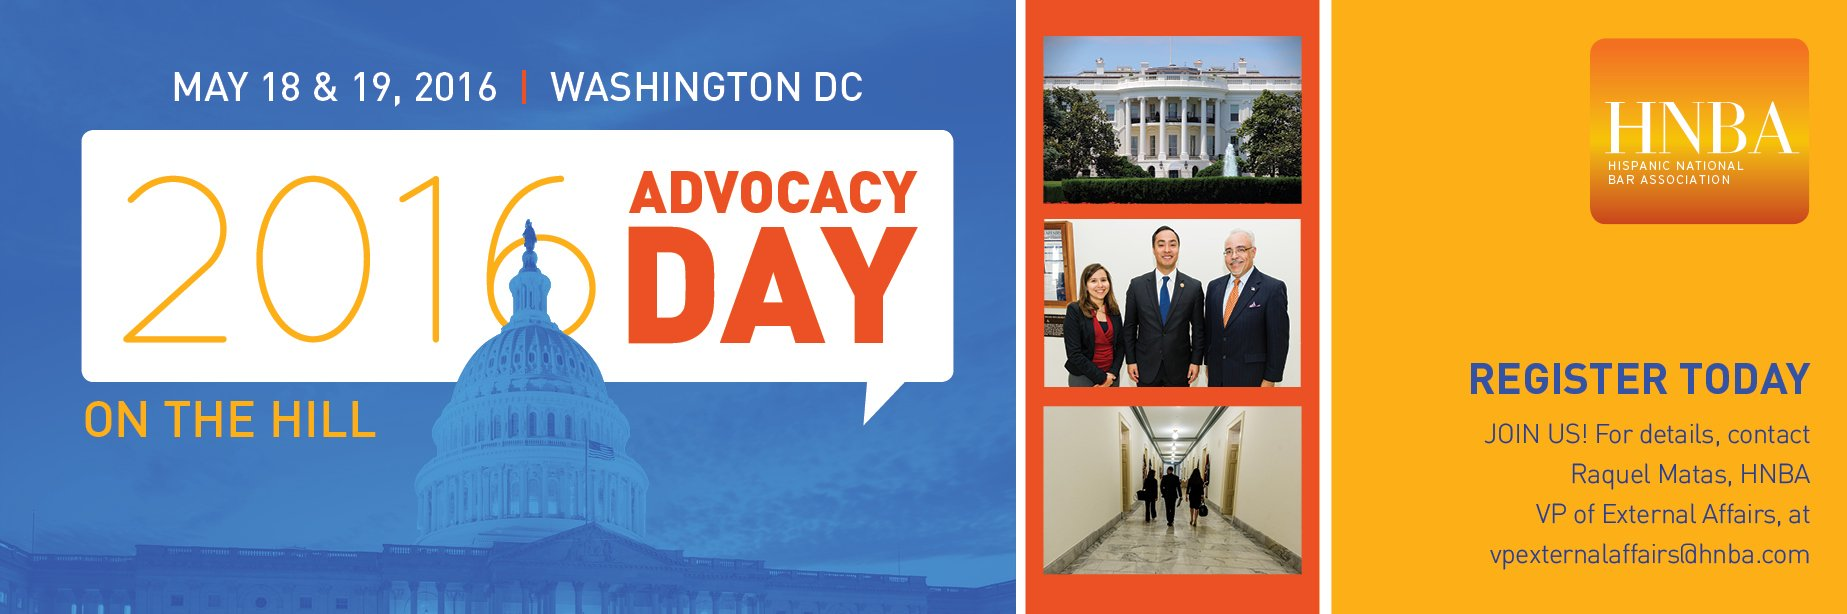 Web_AdvocacyDay